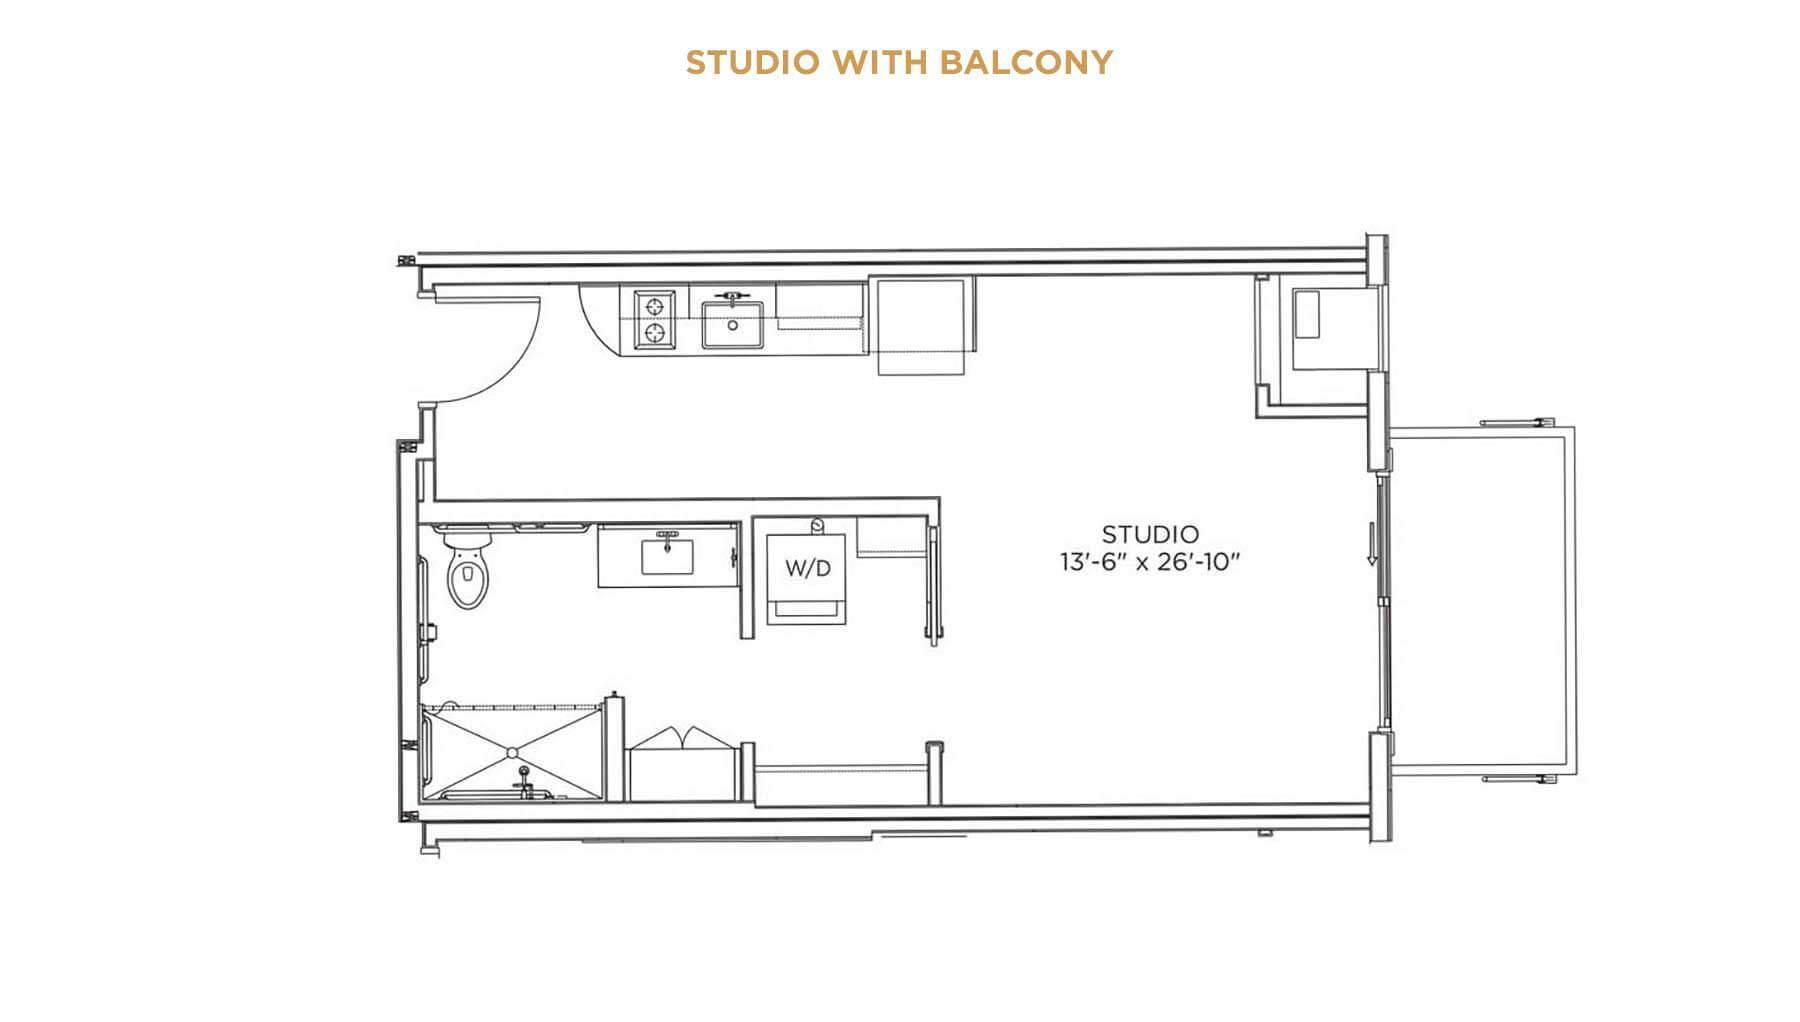 Studio with Balcony Floor Plan - senior living housing Cedar Rapids - Grand Living at Indian Creek